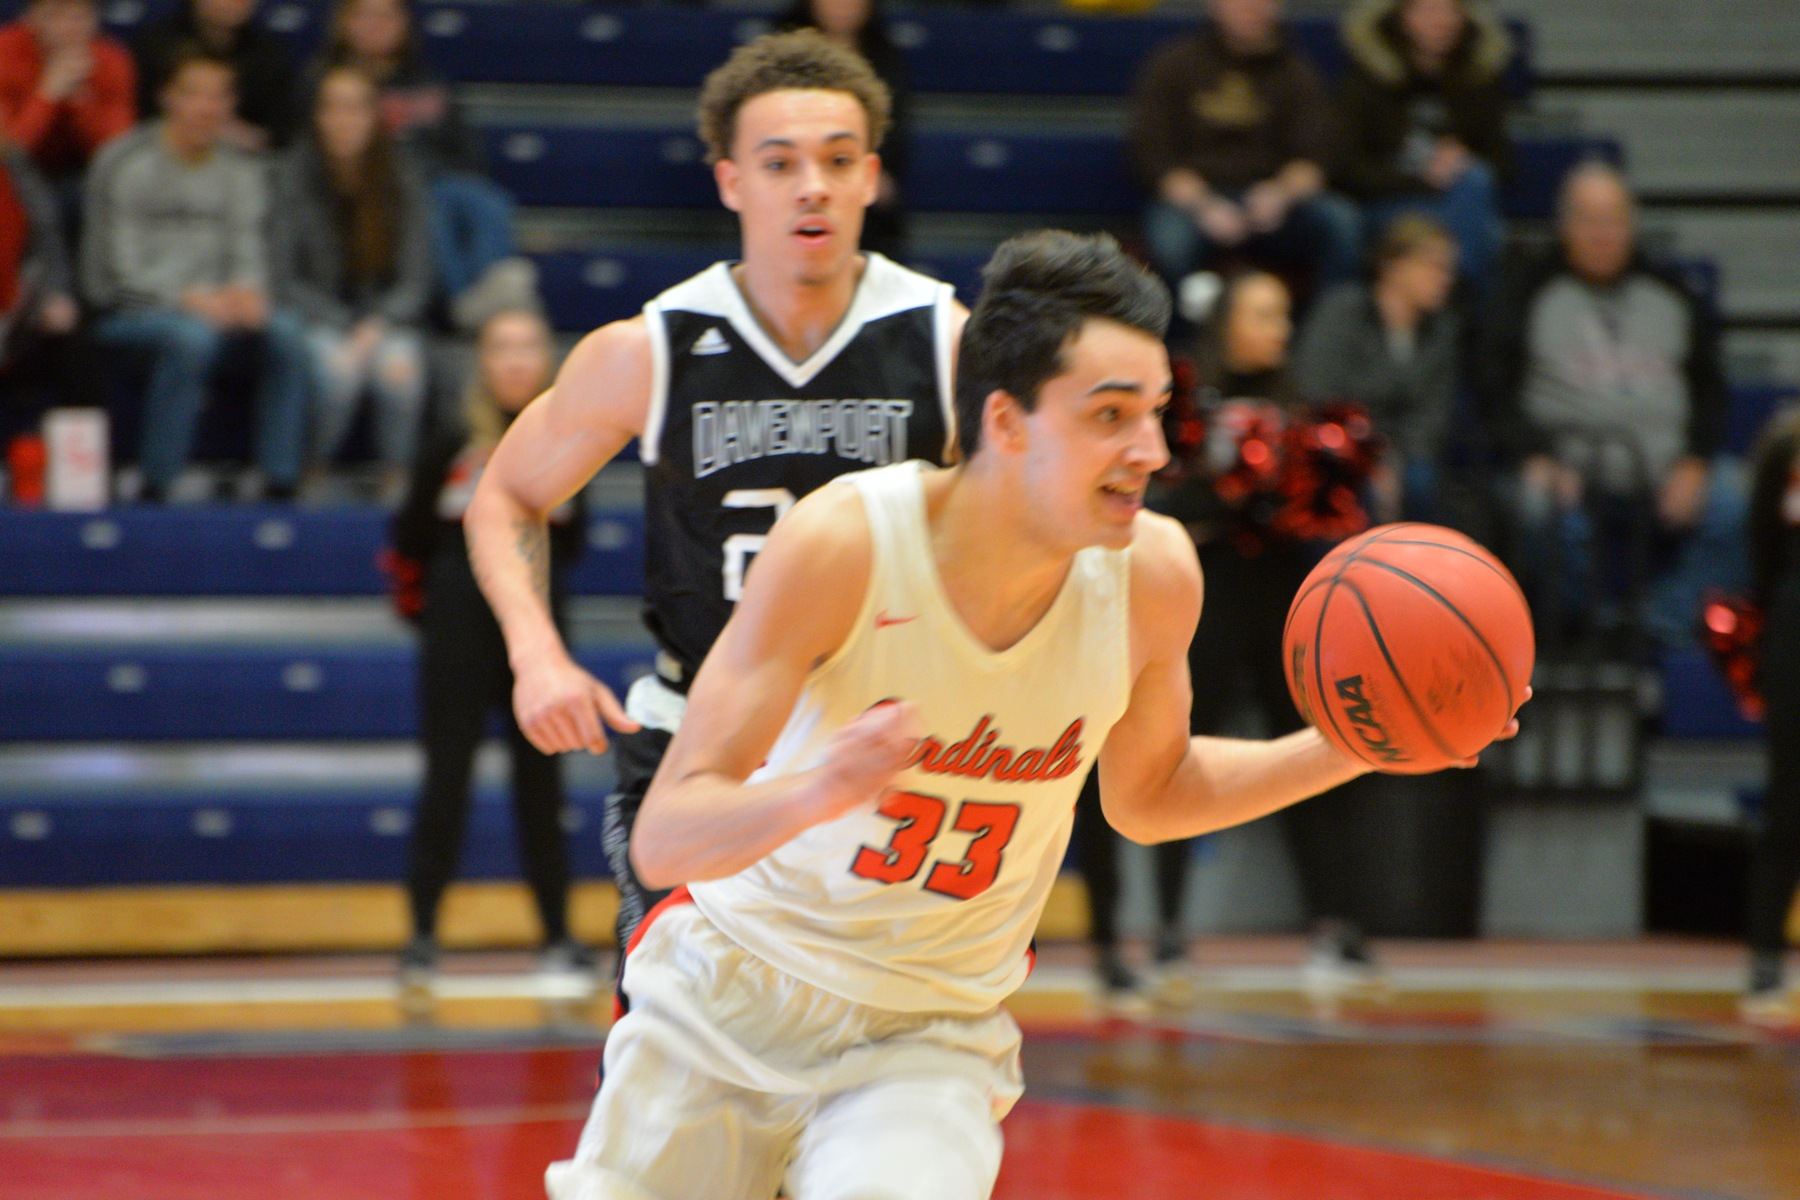 Men's Basketball vs Davenport - Feb. 15. 2020 - Saginaw Valley State